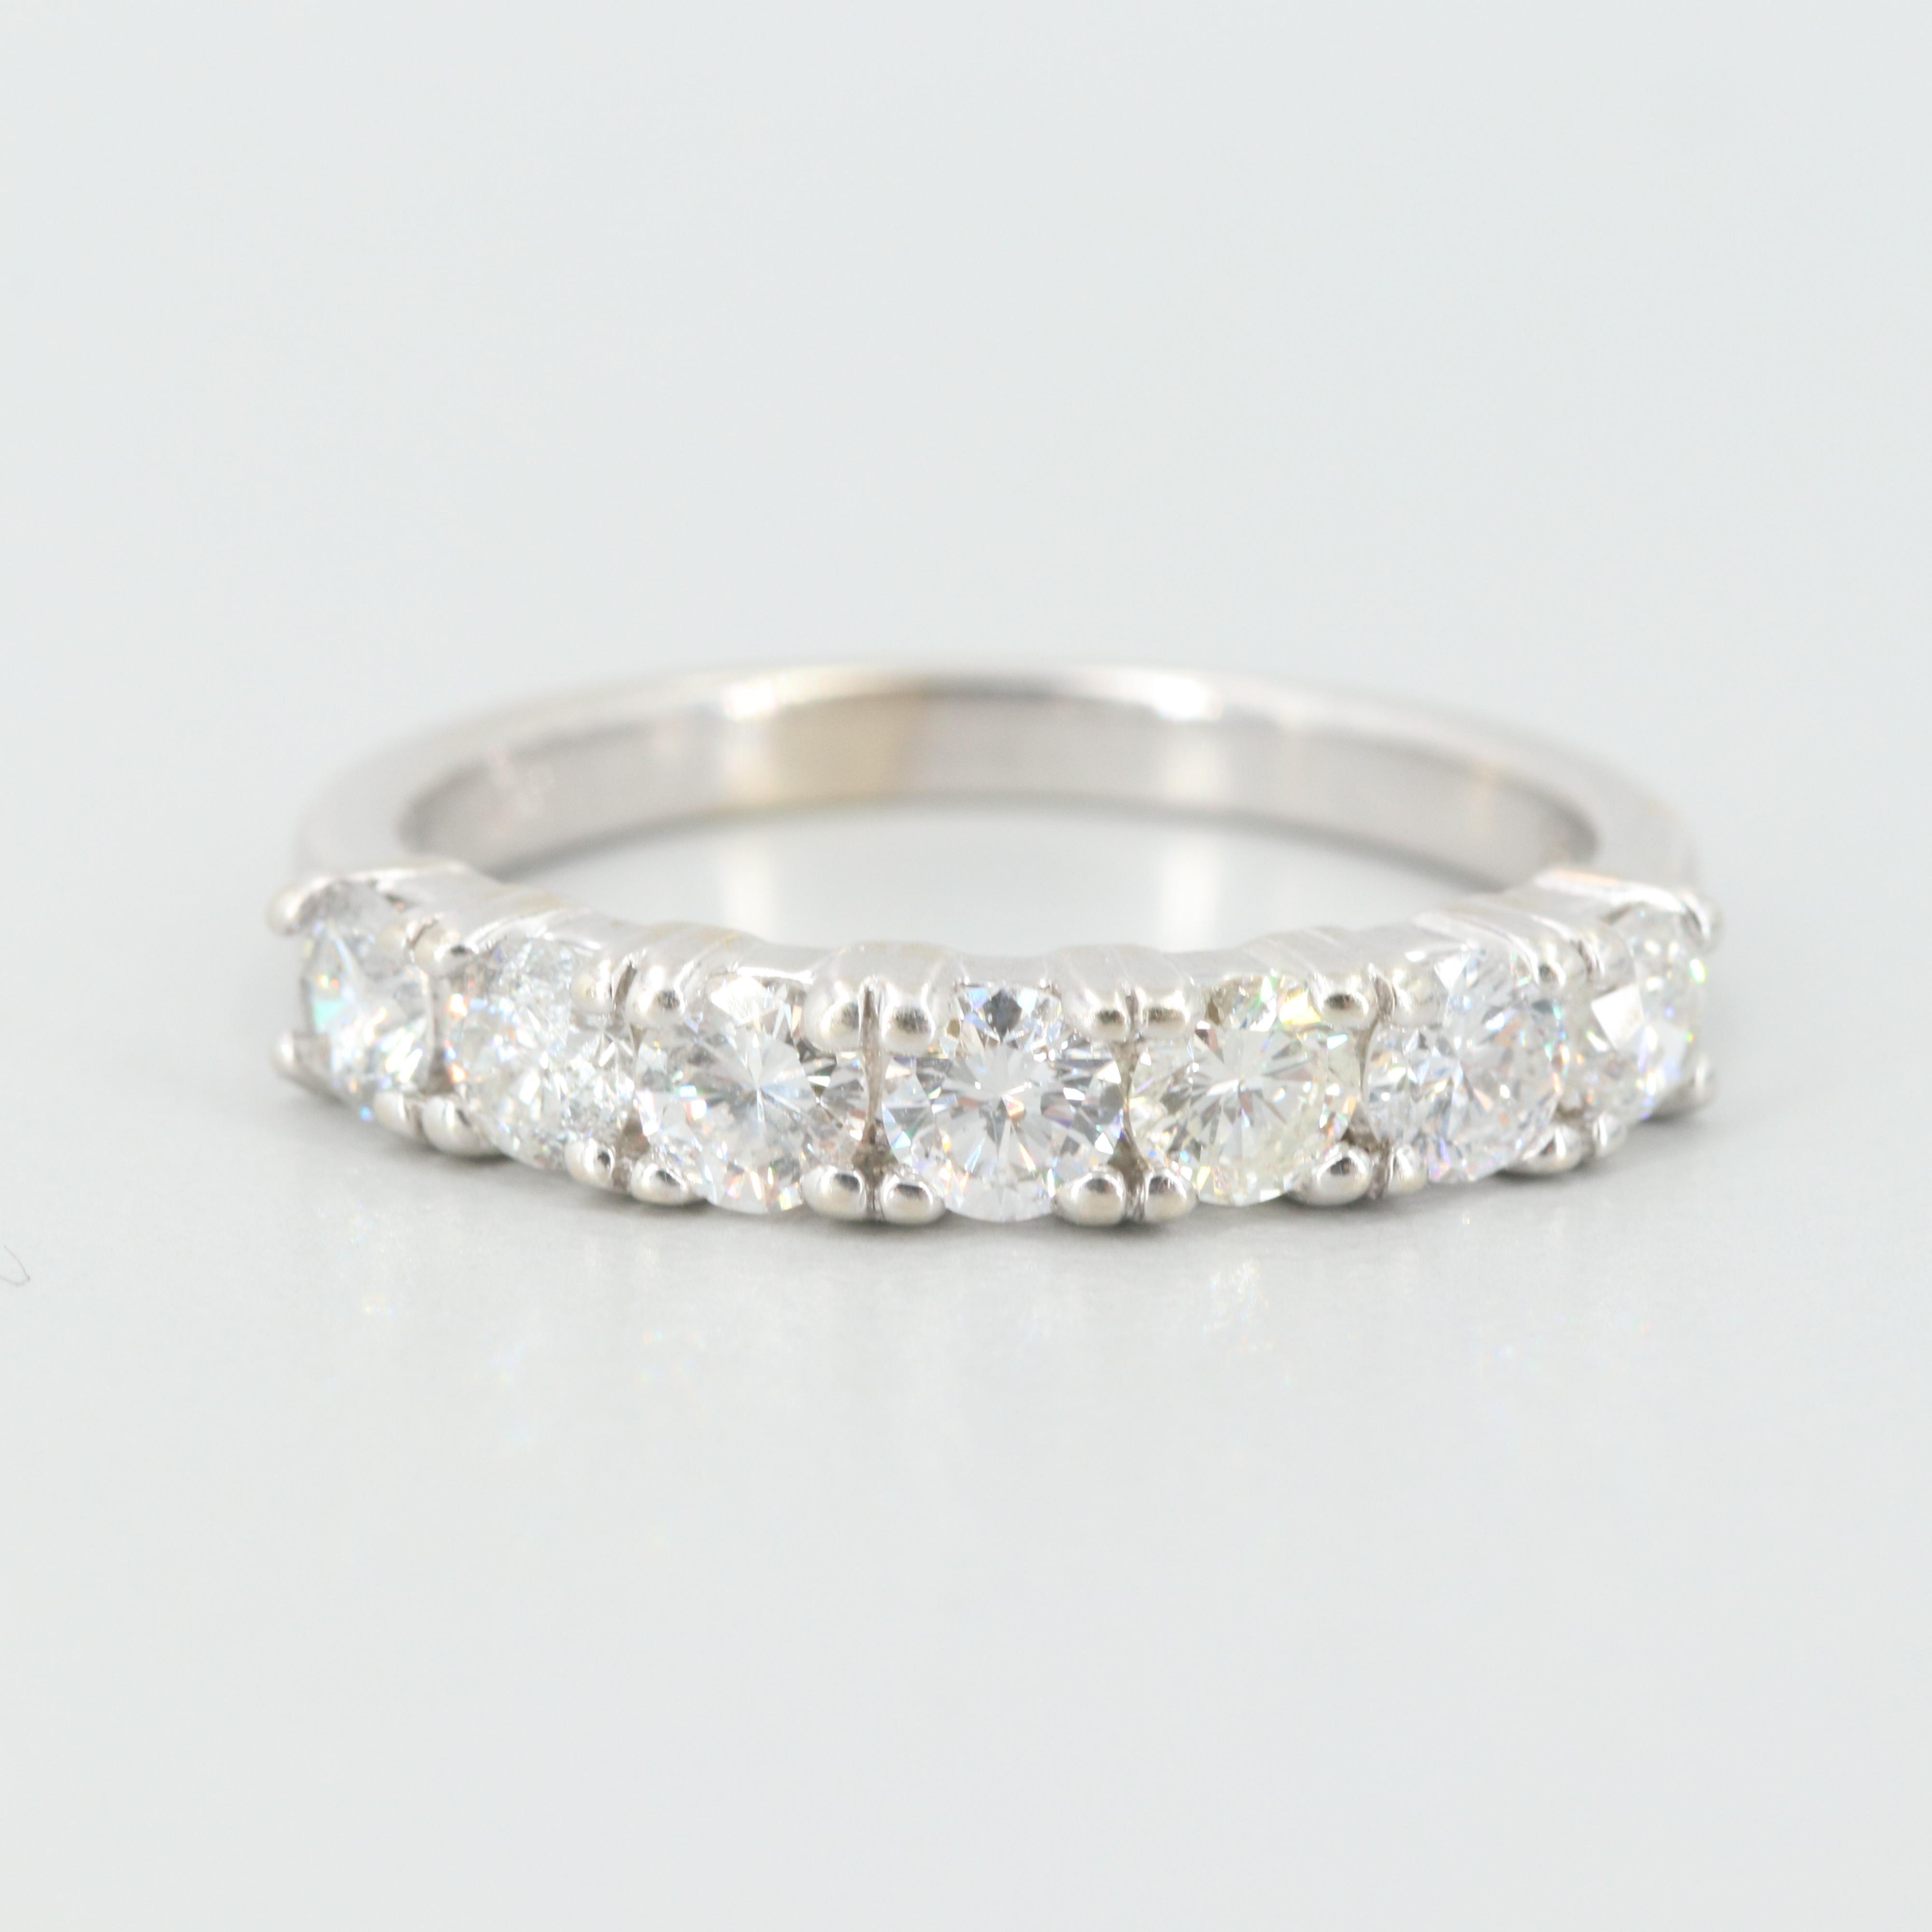 14K White Gold 1.05 CTW Diamond Ring